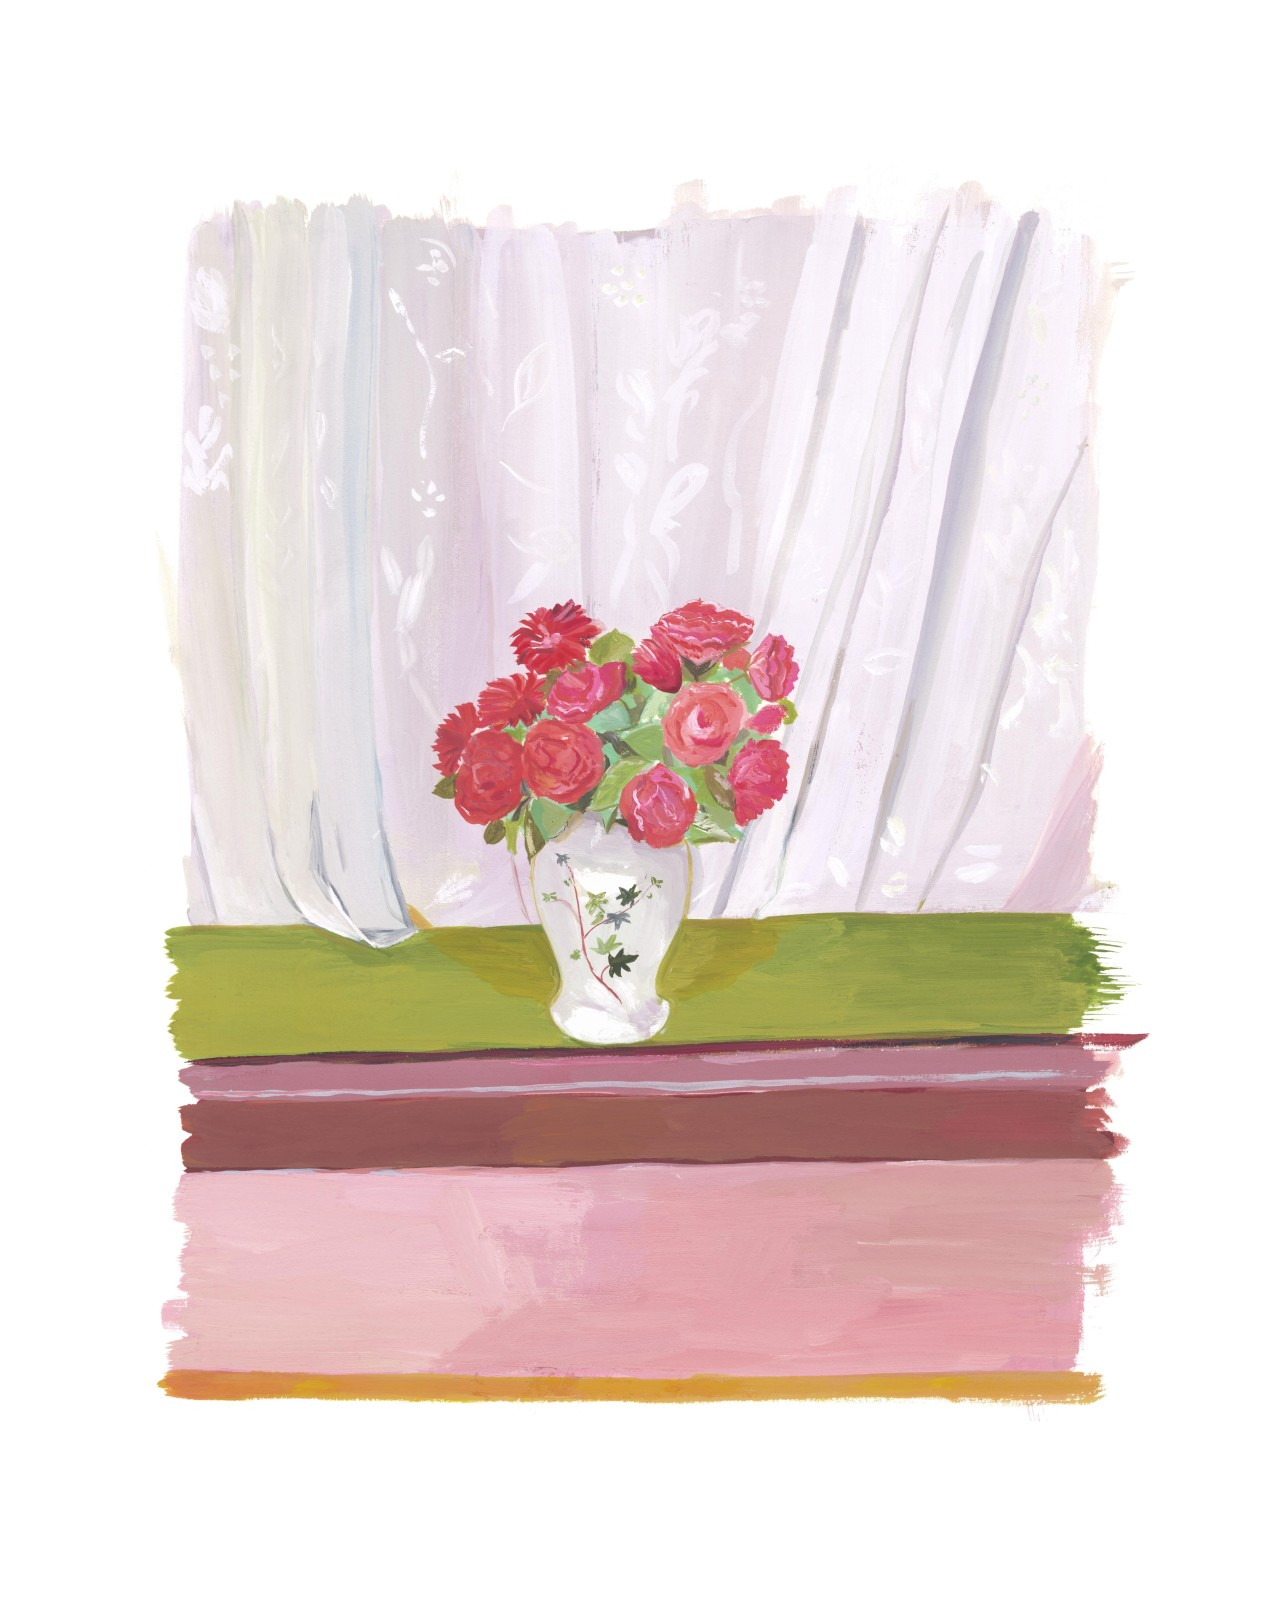 Roses, 2004 - 2005